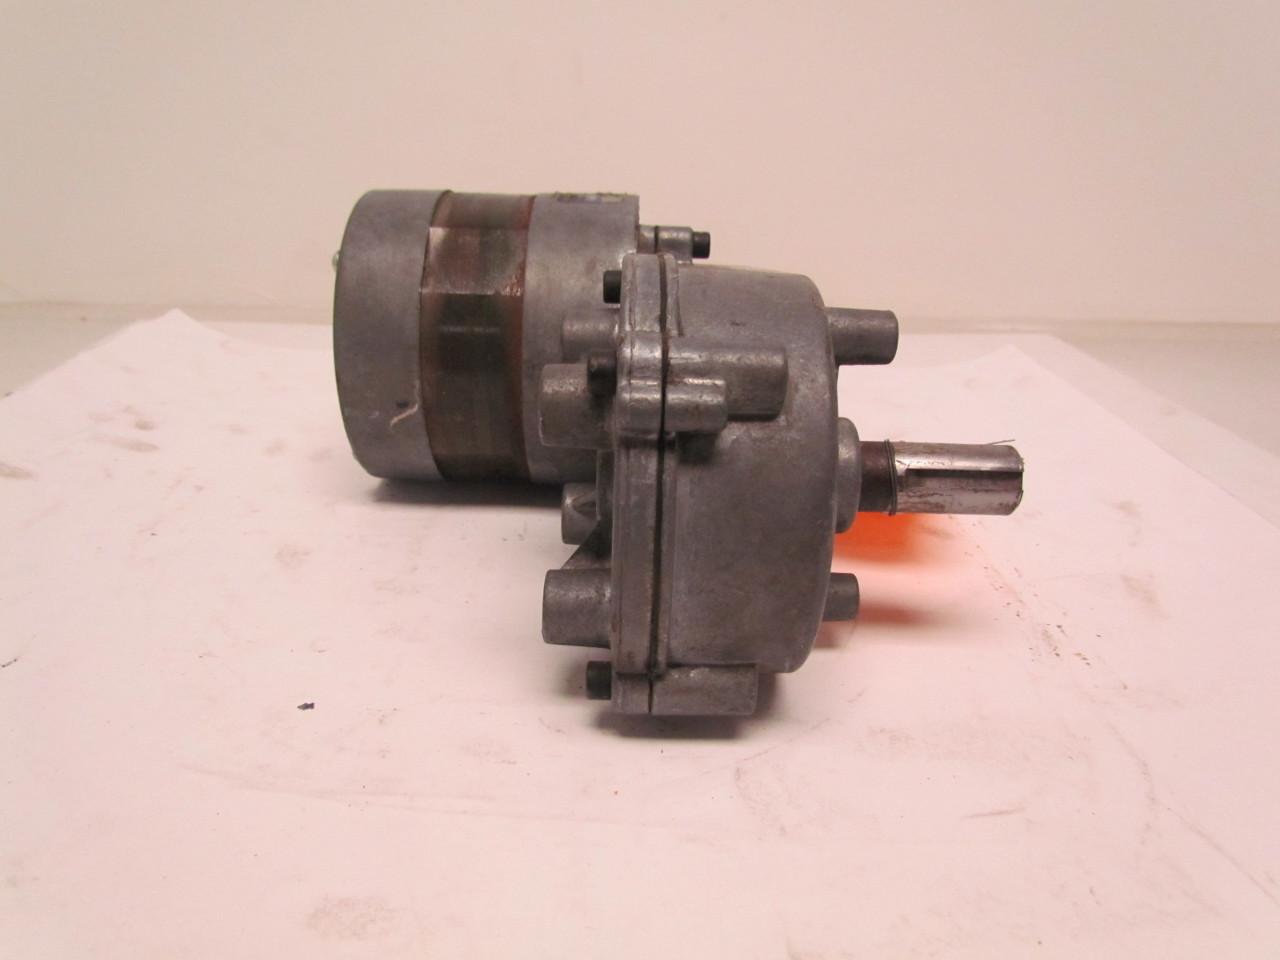 Fasco v00390aj62 1 6hp electric gear motor 1ph 115v 6rpm for Gears for electric motors